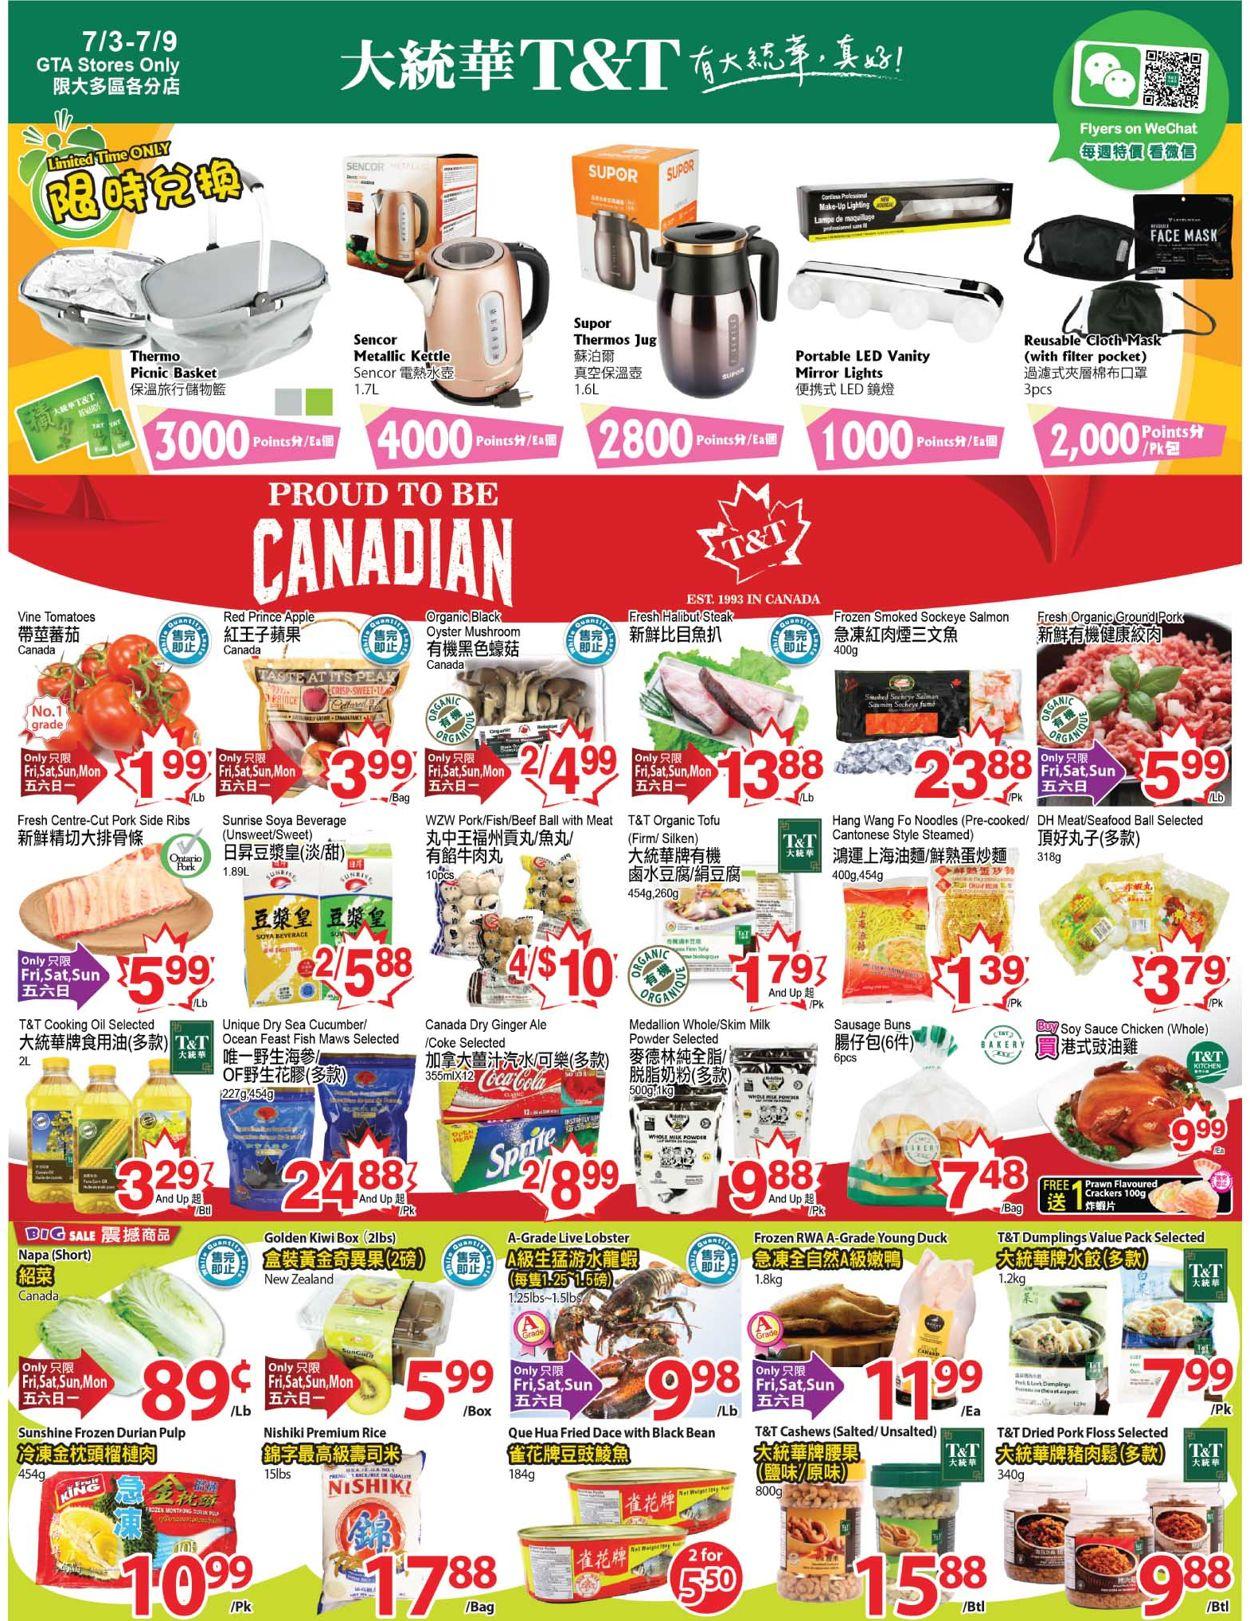 T&T Supermarket Flyer - 07/03-07/09/2020